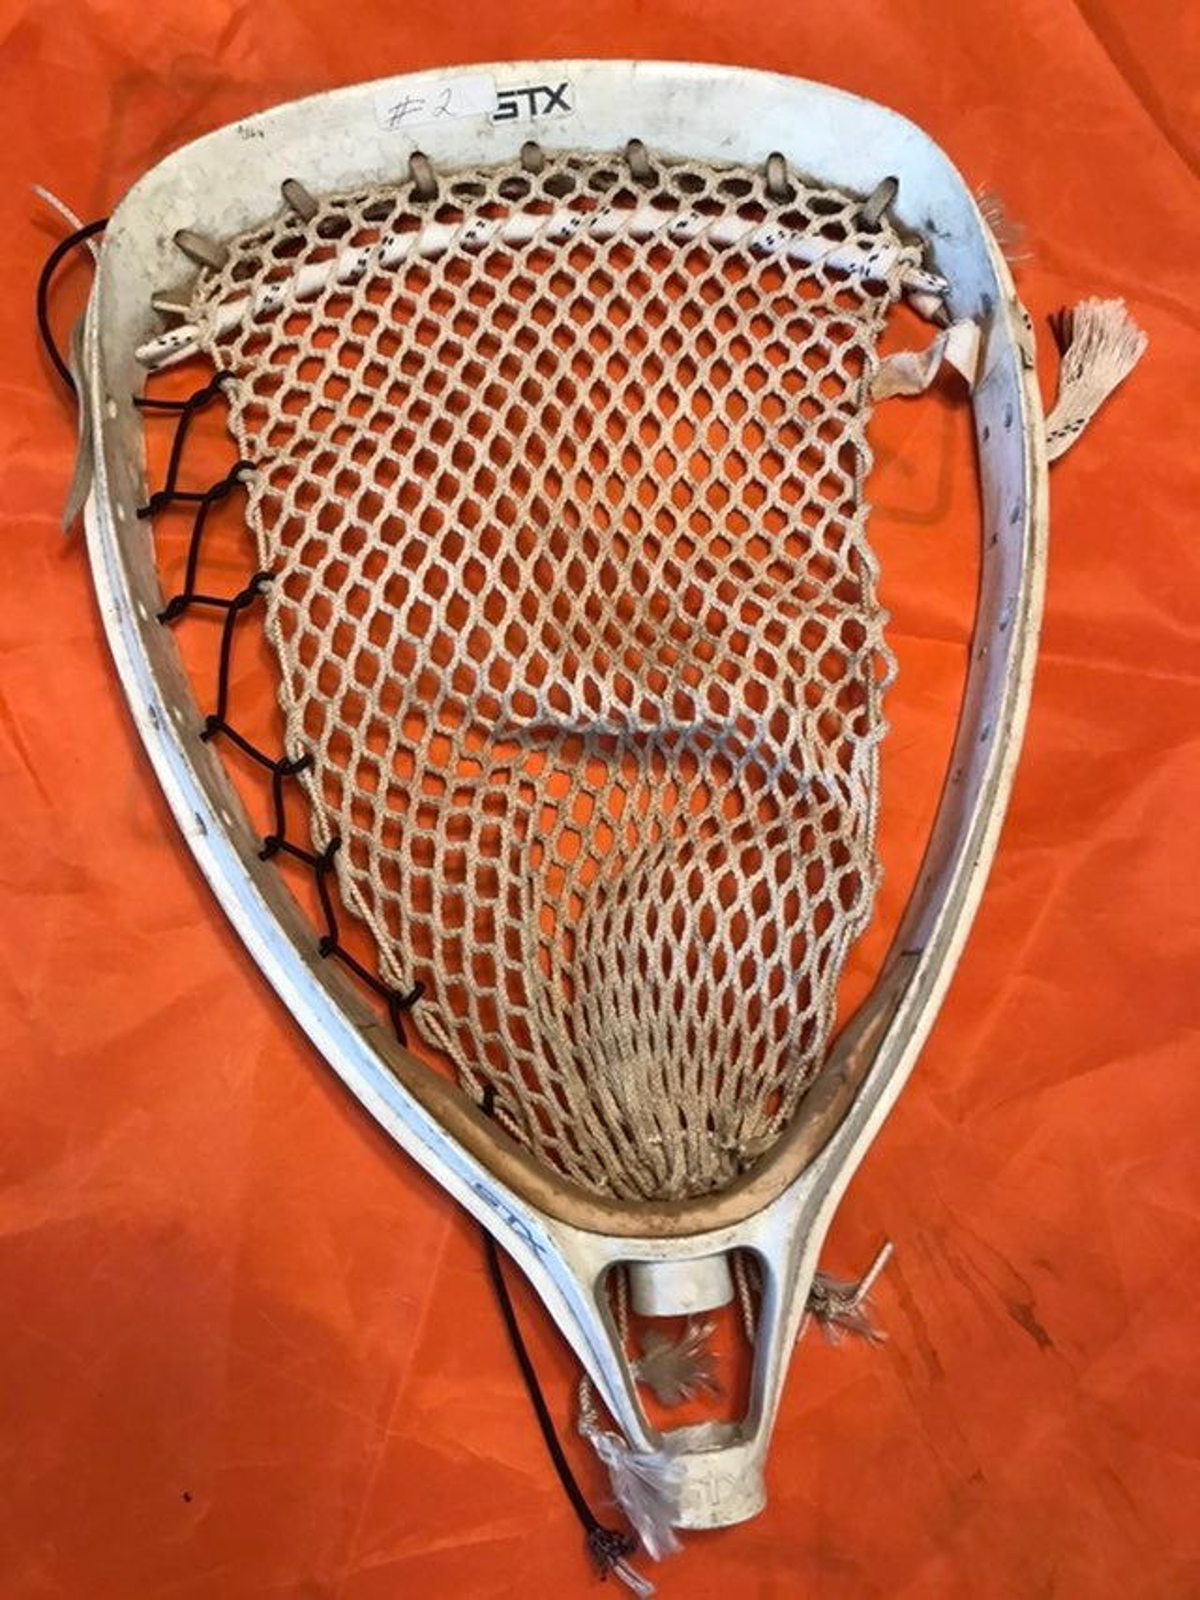 NEW boys lacrosse stick